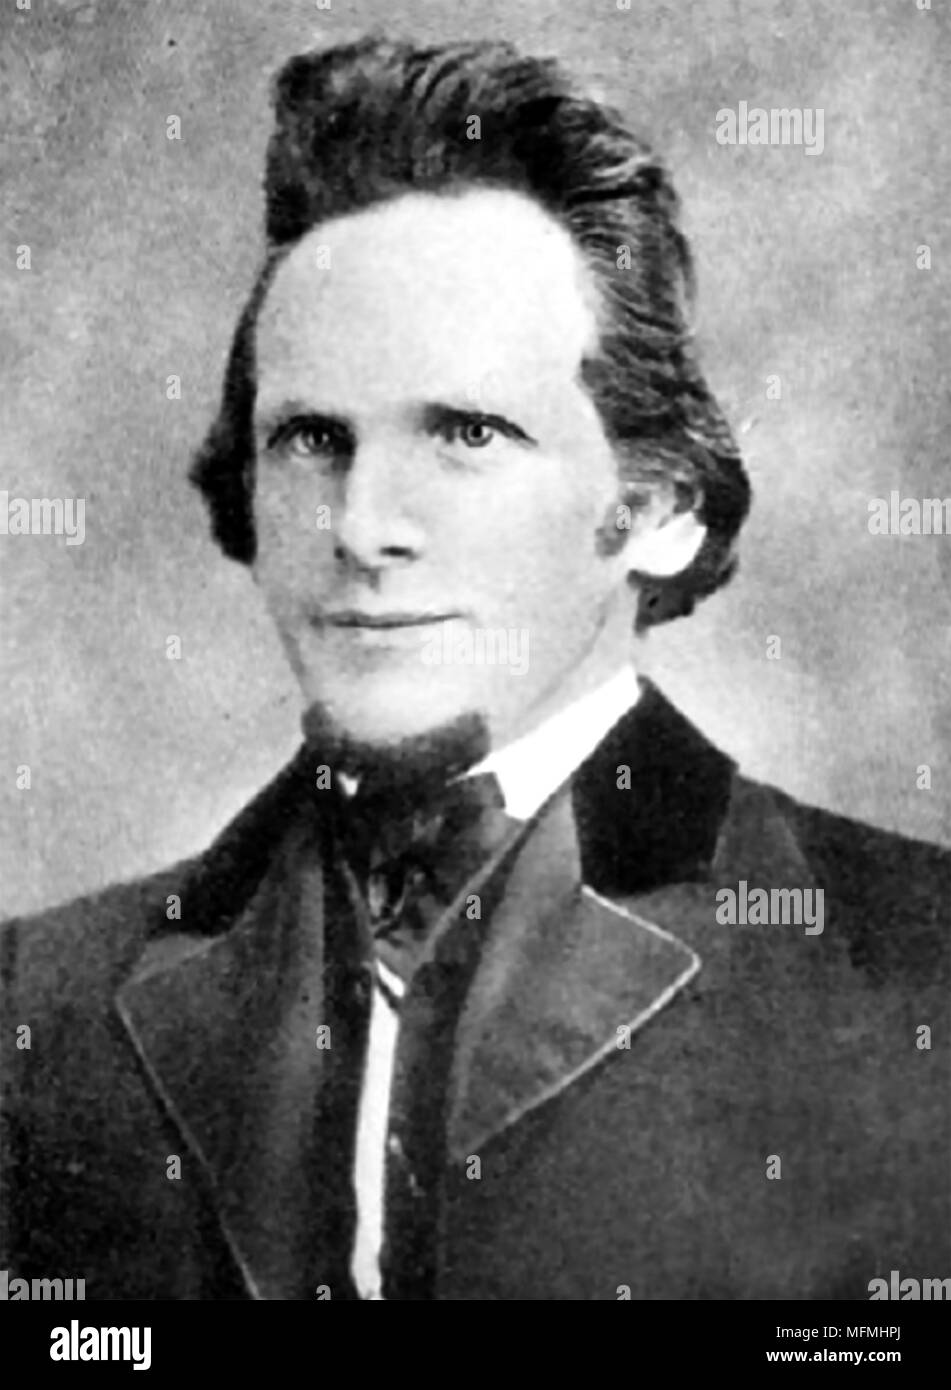 ASA GILBERT EDDY (1826-1882) third husband of Mary Baker Eddy - Stock Image